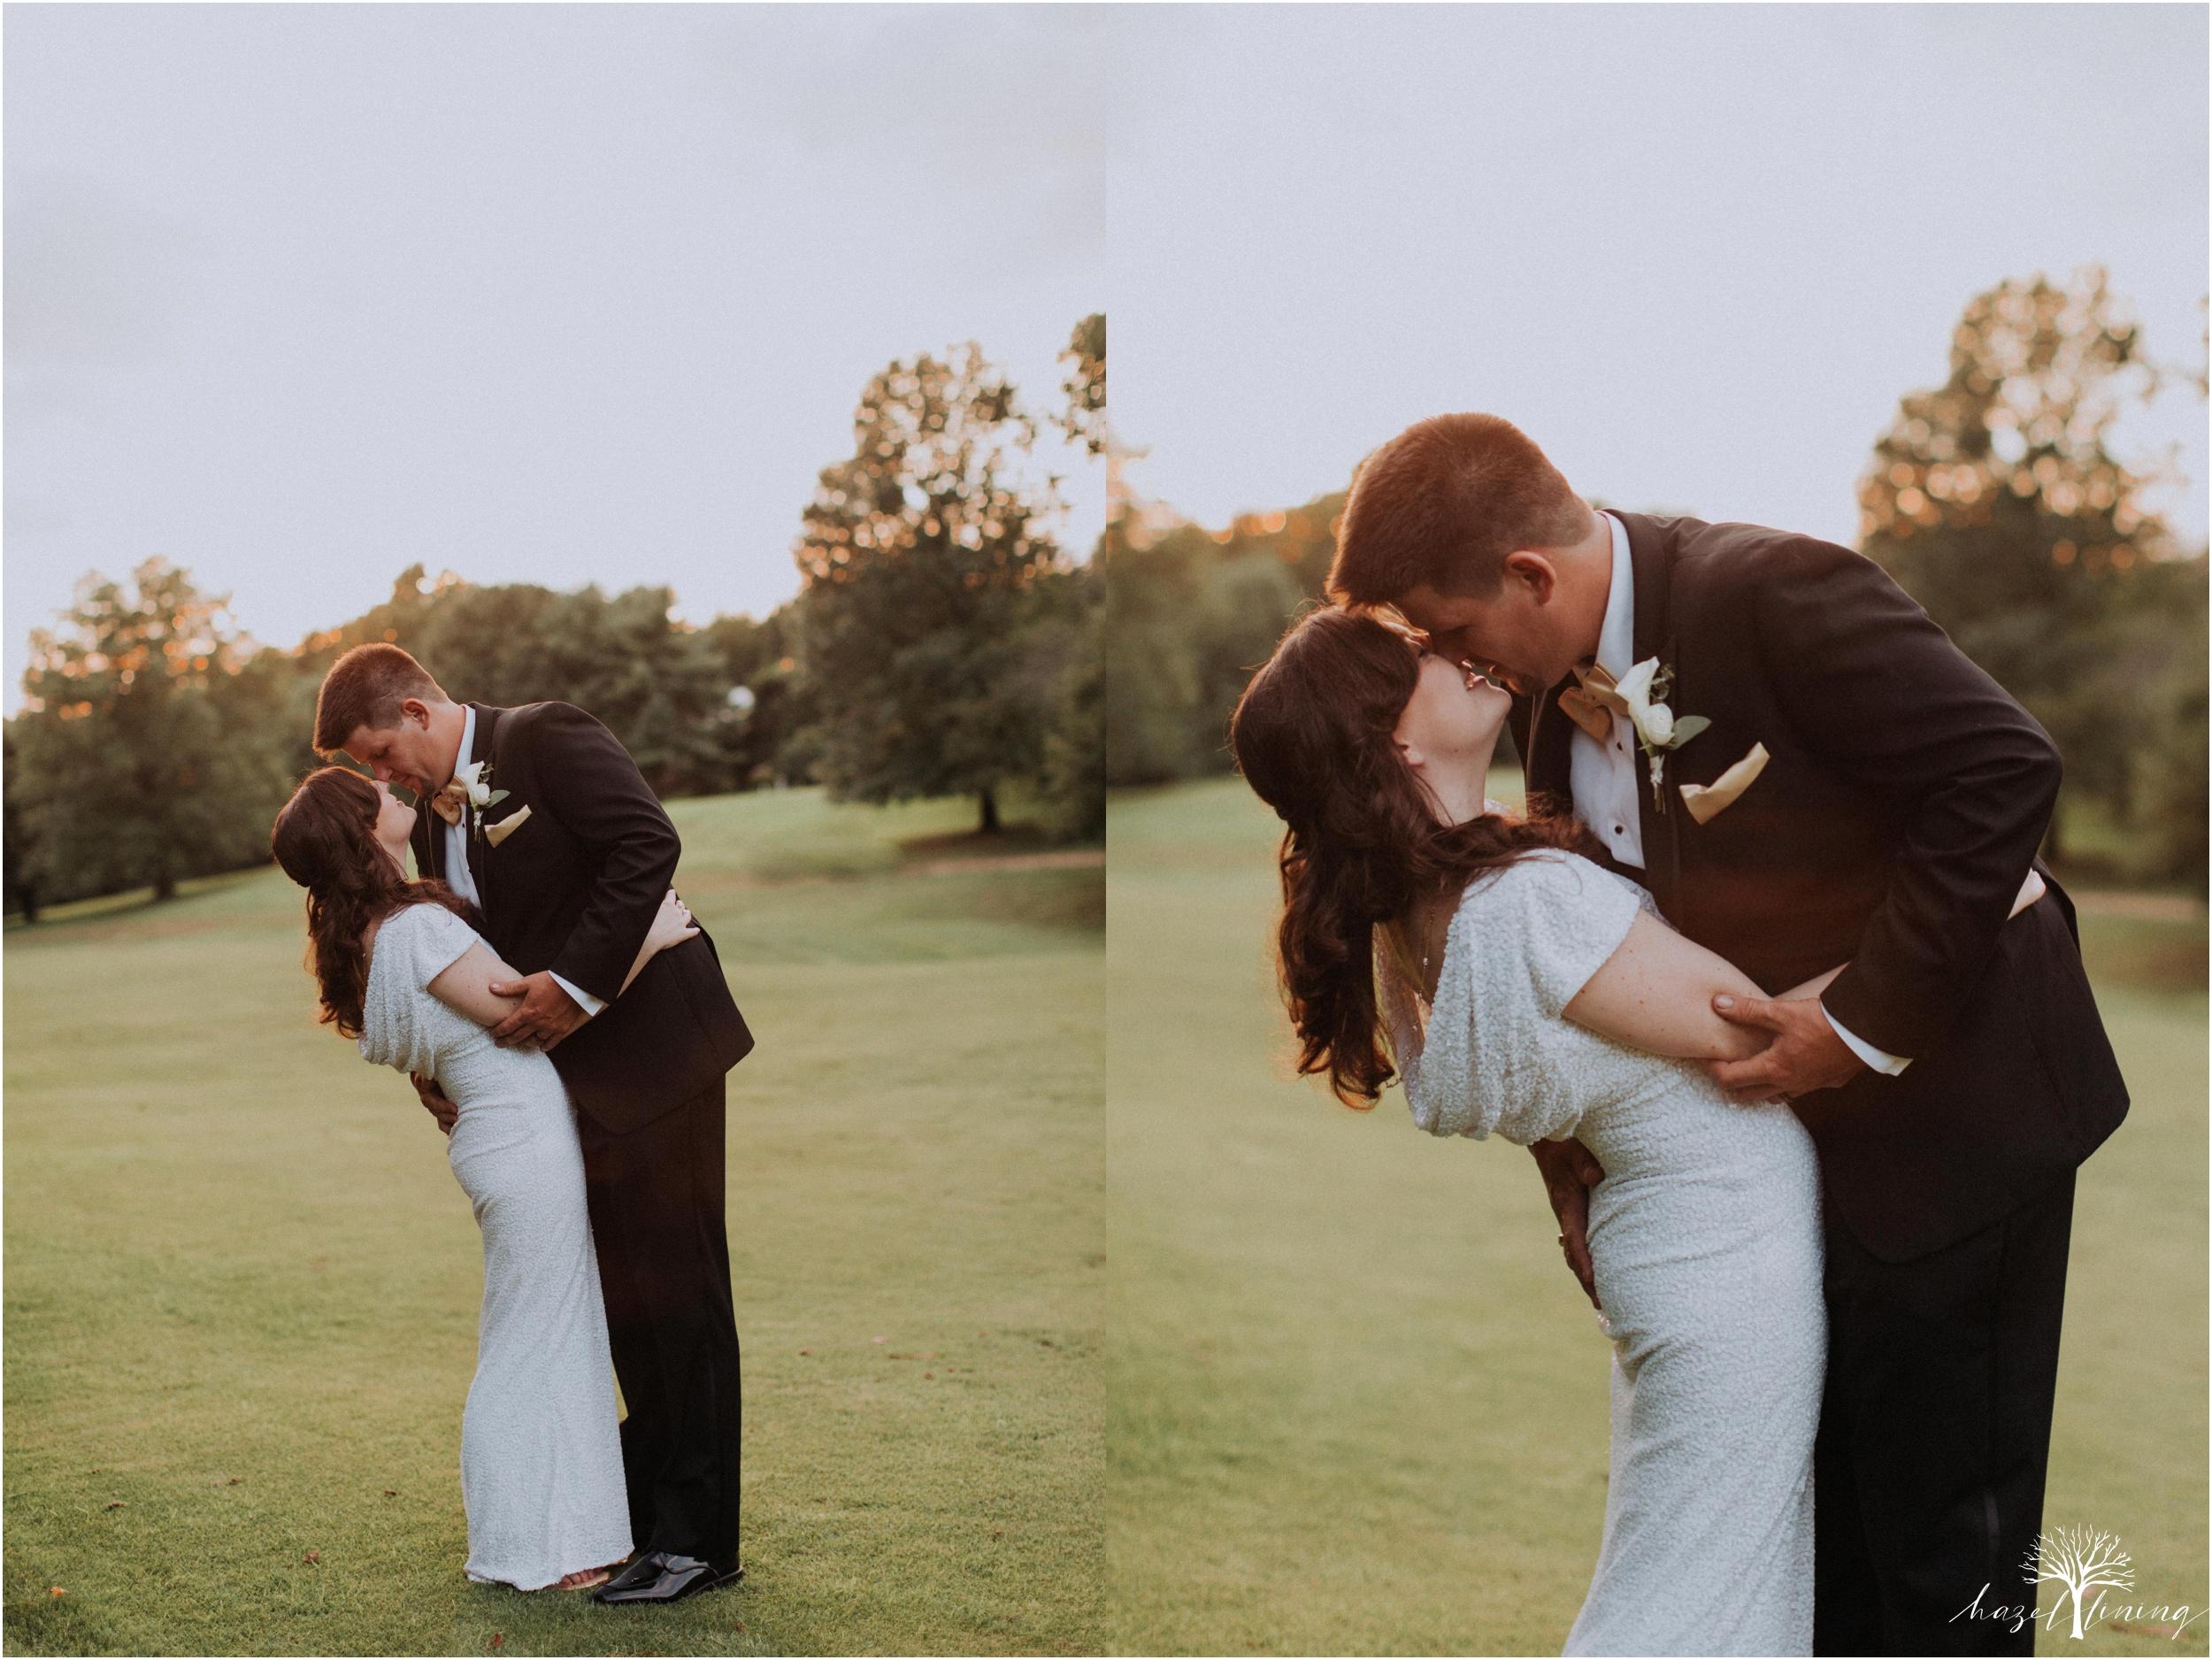 elizabeth-doelp-andrew-foreback-middletown-country-club-summer-langhorne-pennsylvania-wedding-hazel-lining-travel-wedding-elopement-photography_0176.jpg